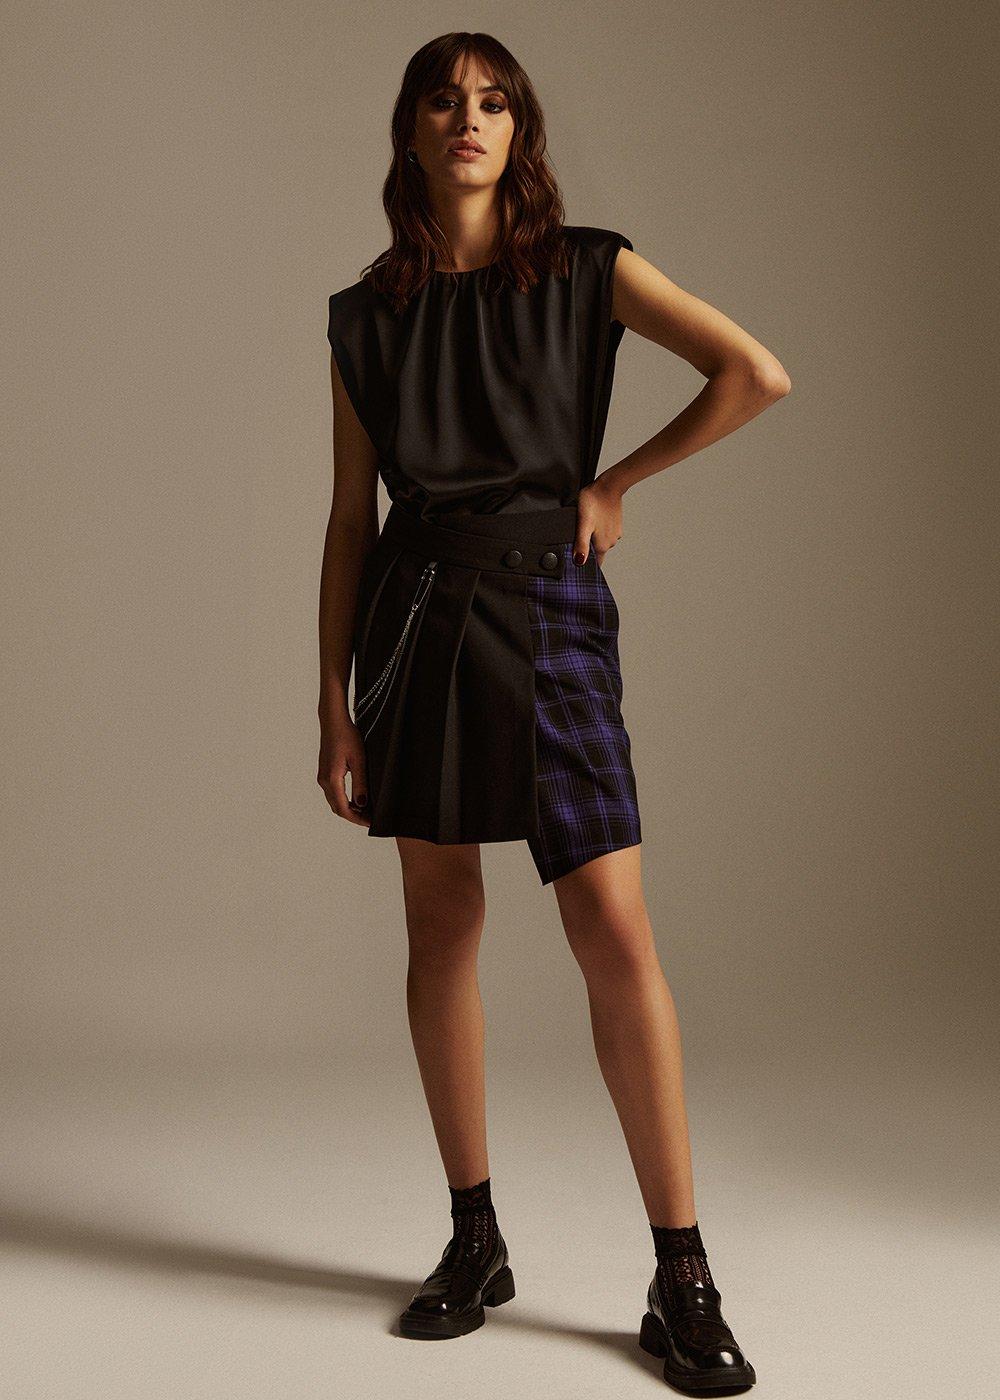 Giada short and asymmetrical Skirt - Black/Violet/Fantasia - Woman